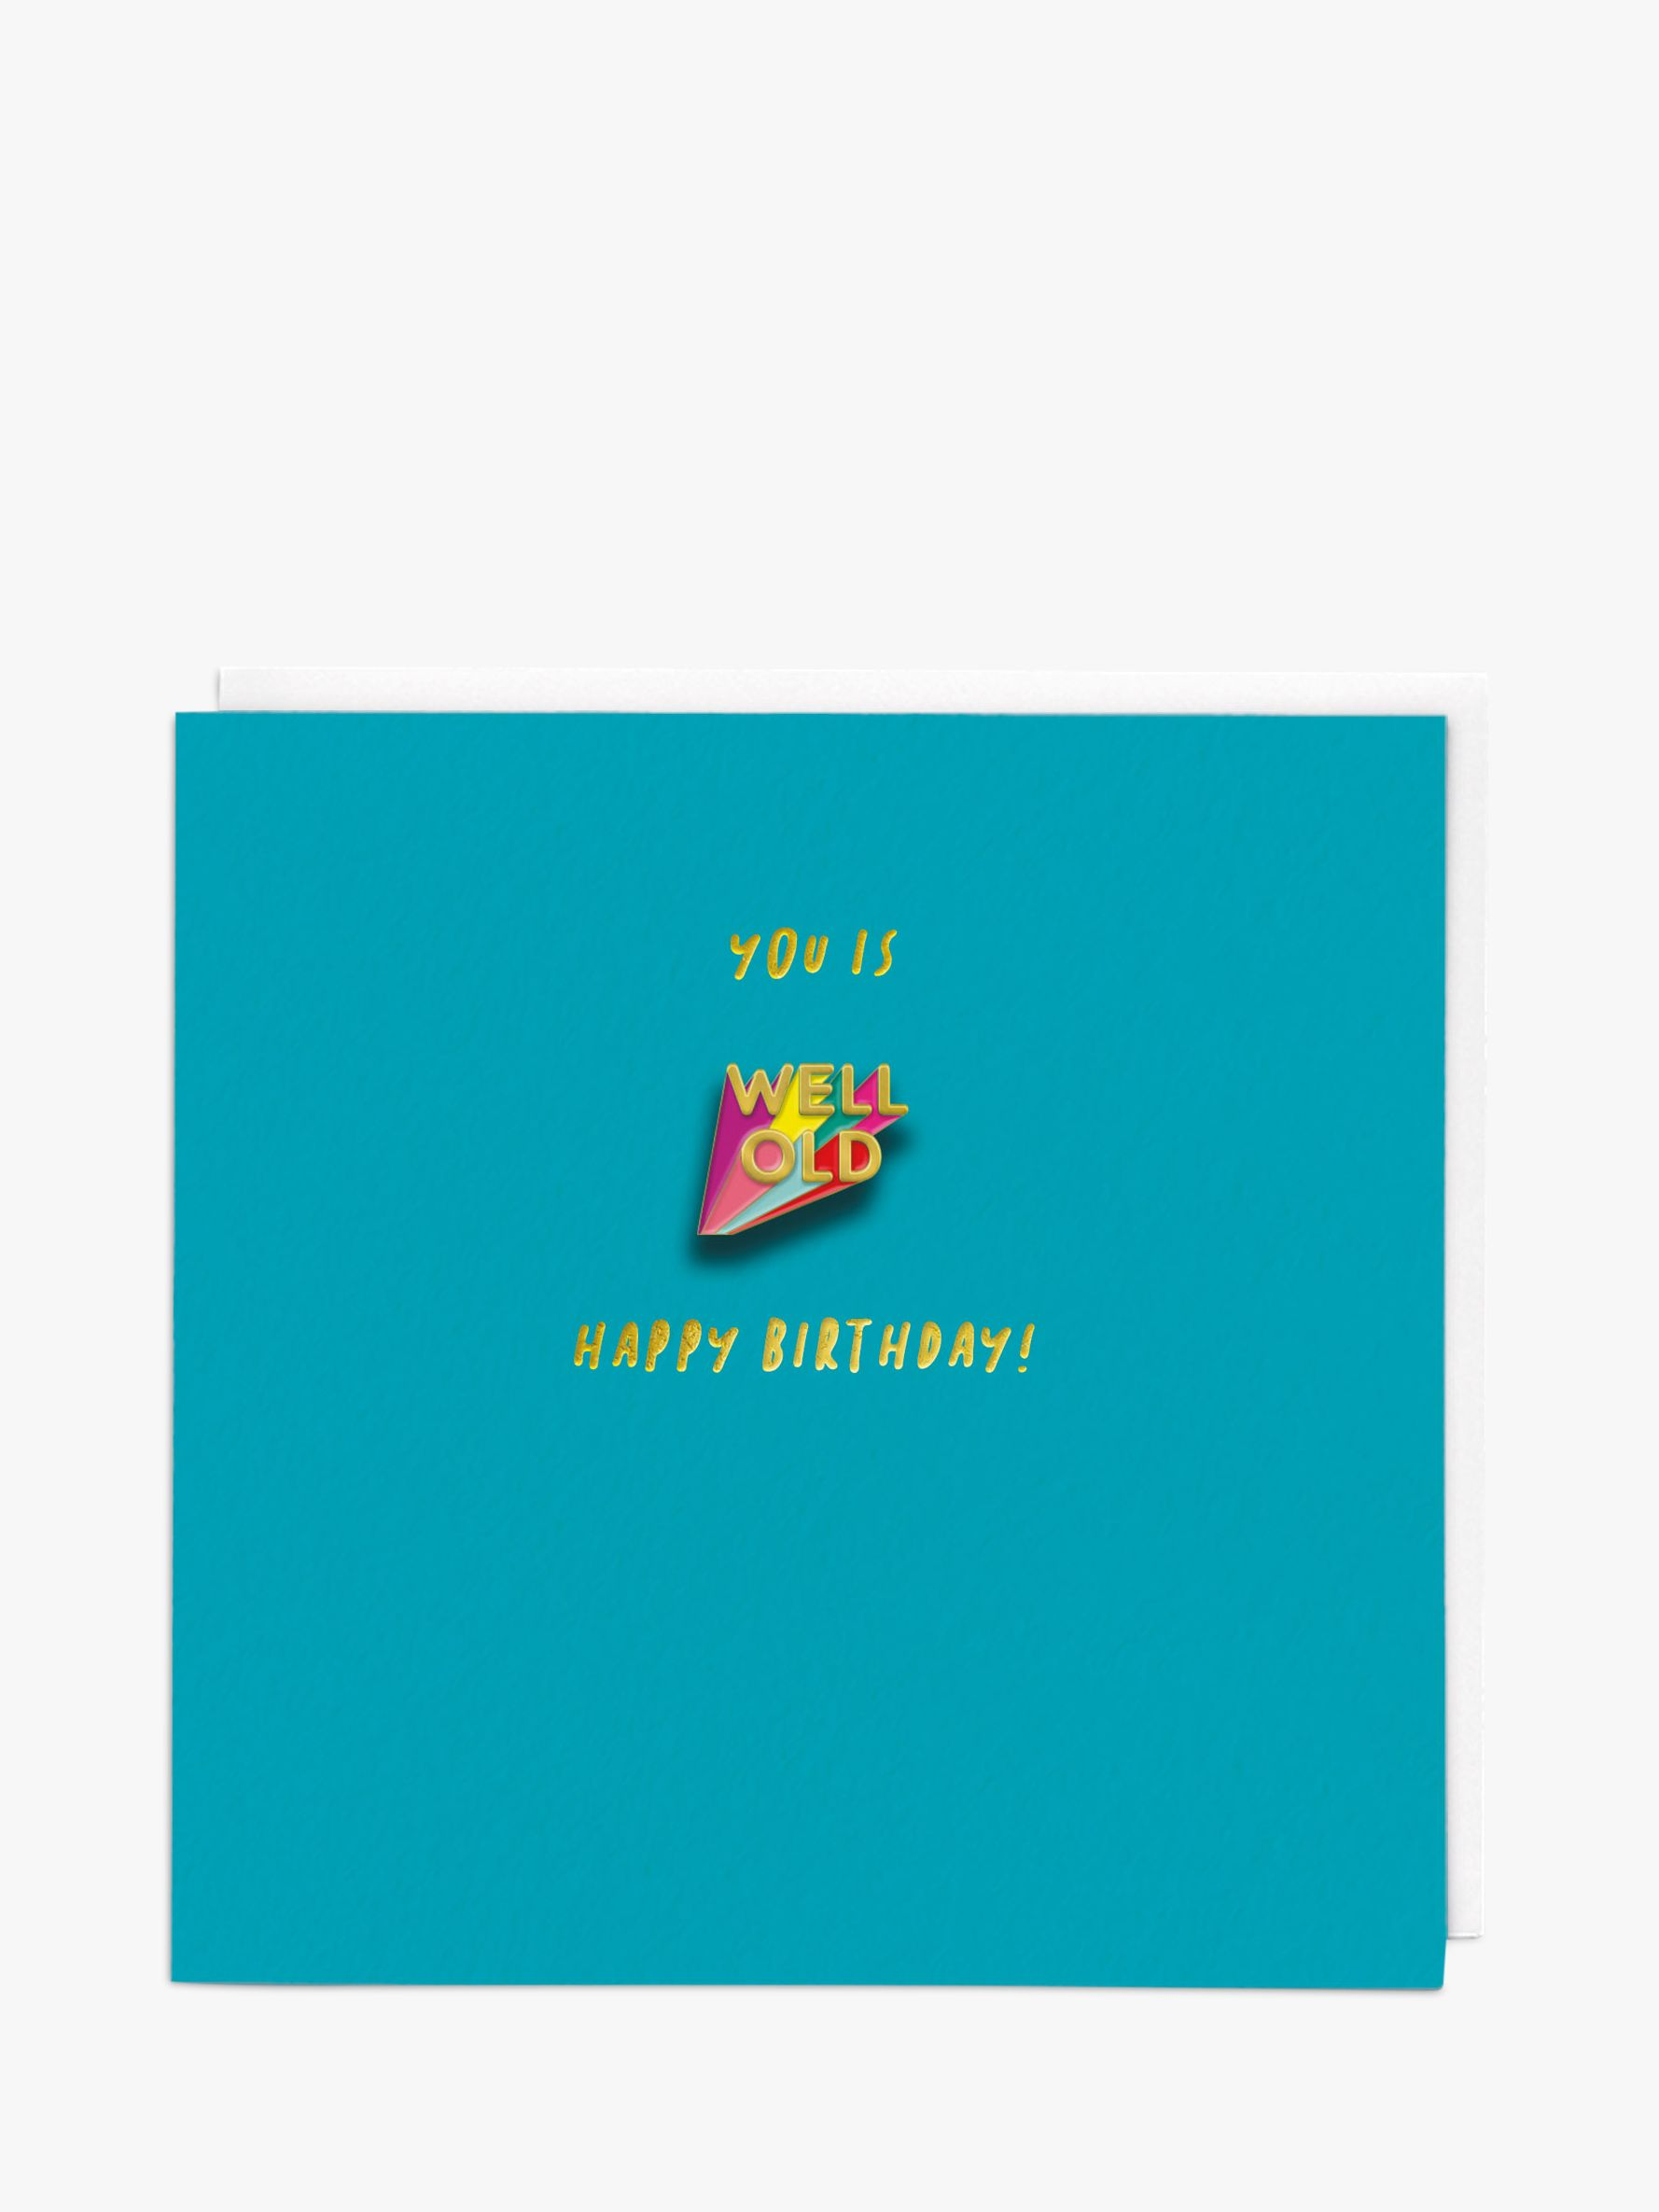 Redback Cards Redback Cards Well Old Birthday Card